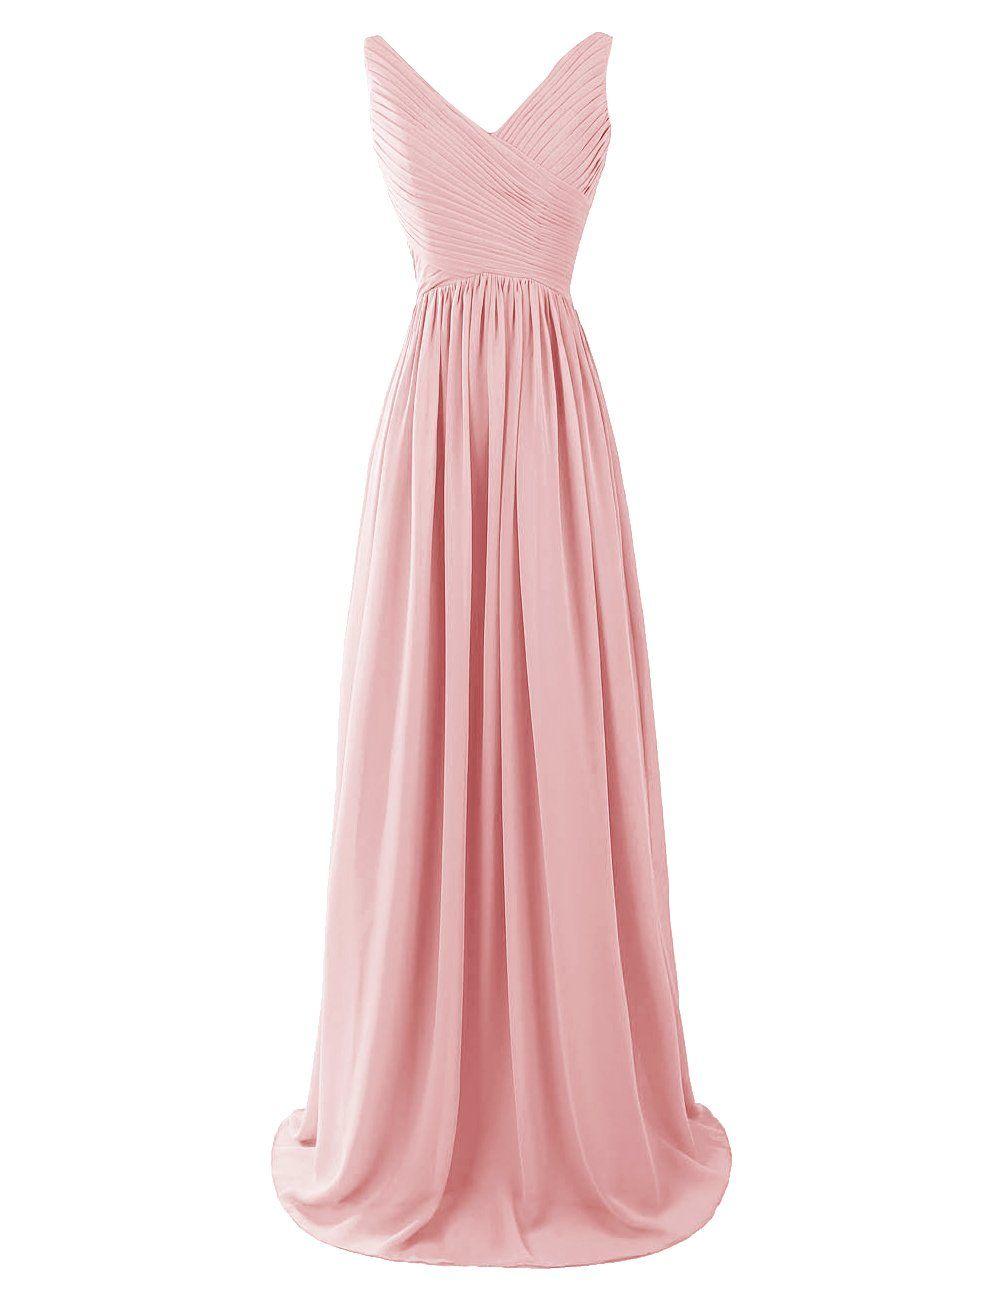 Dresstells® Women\'s Long Chiffon Bridesmaid Dress | Your dream dress ...